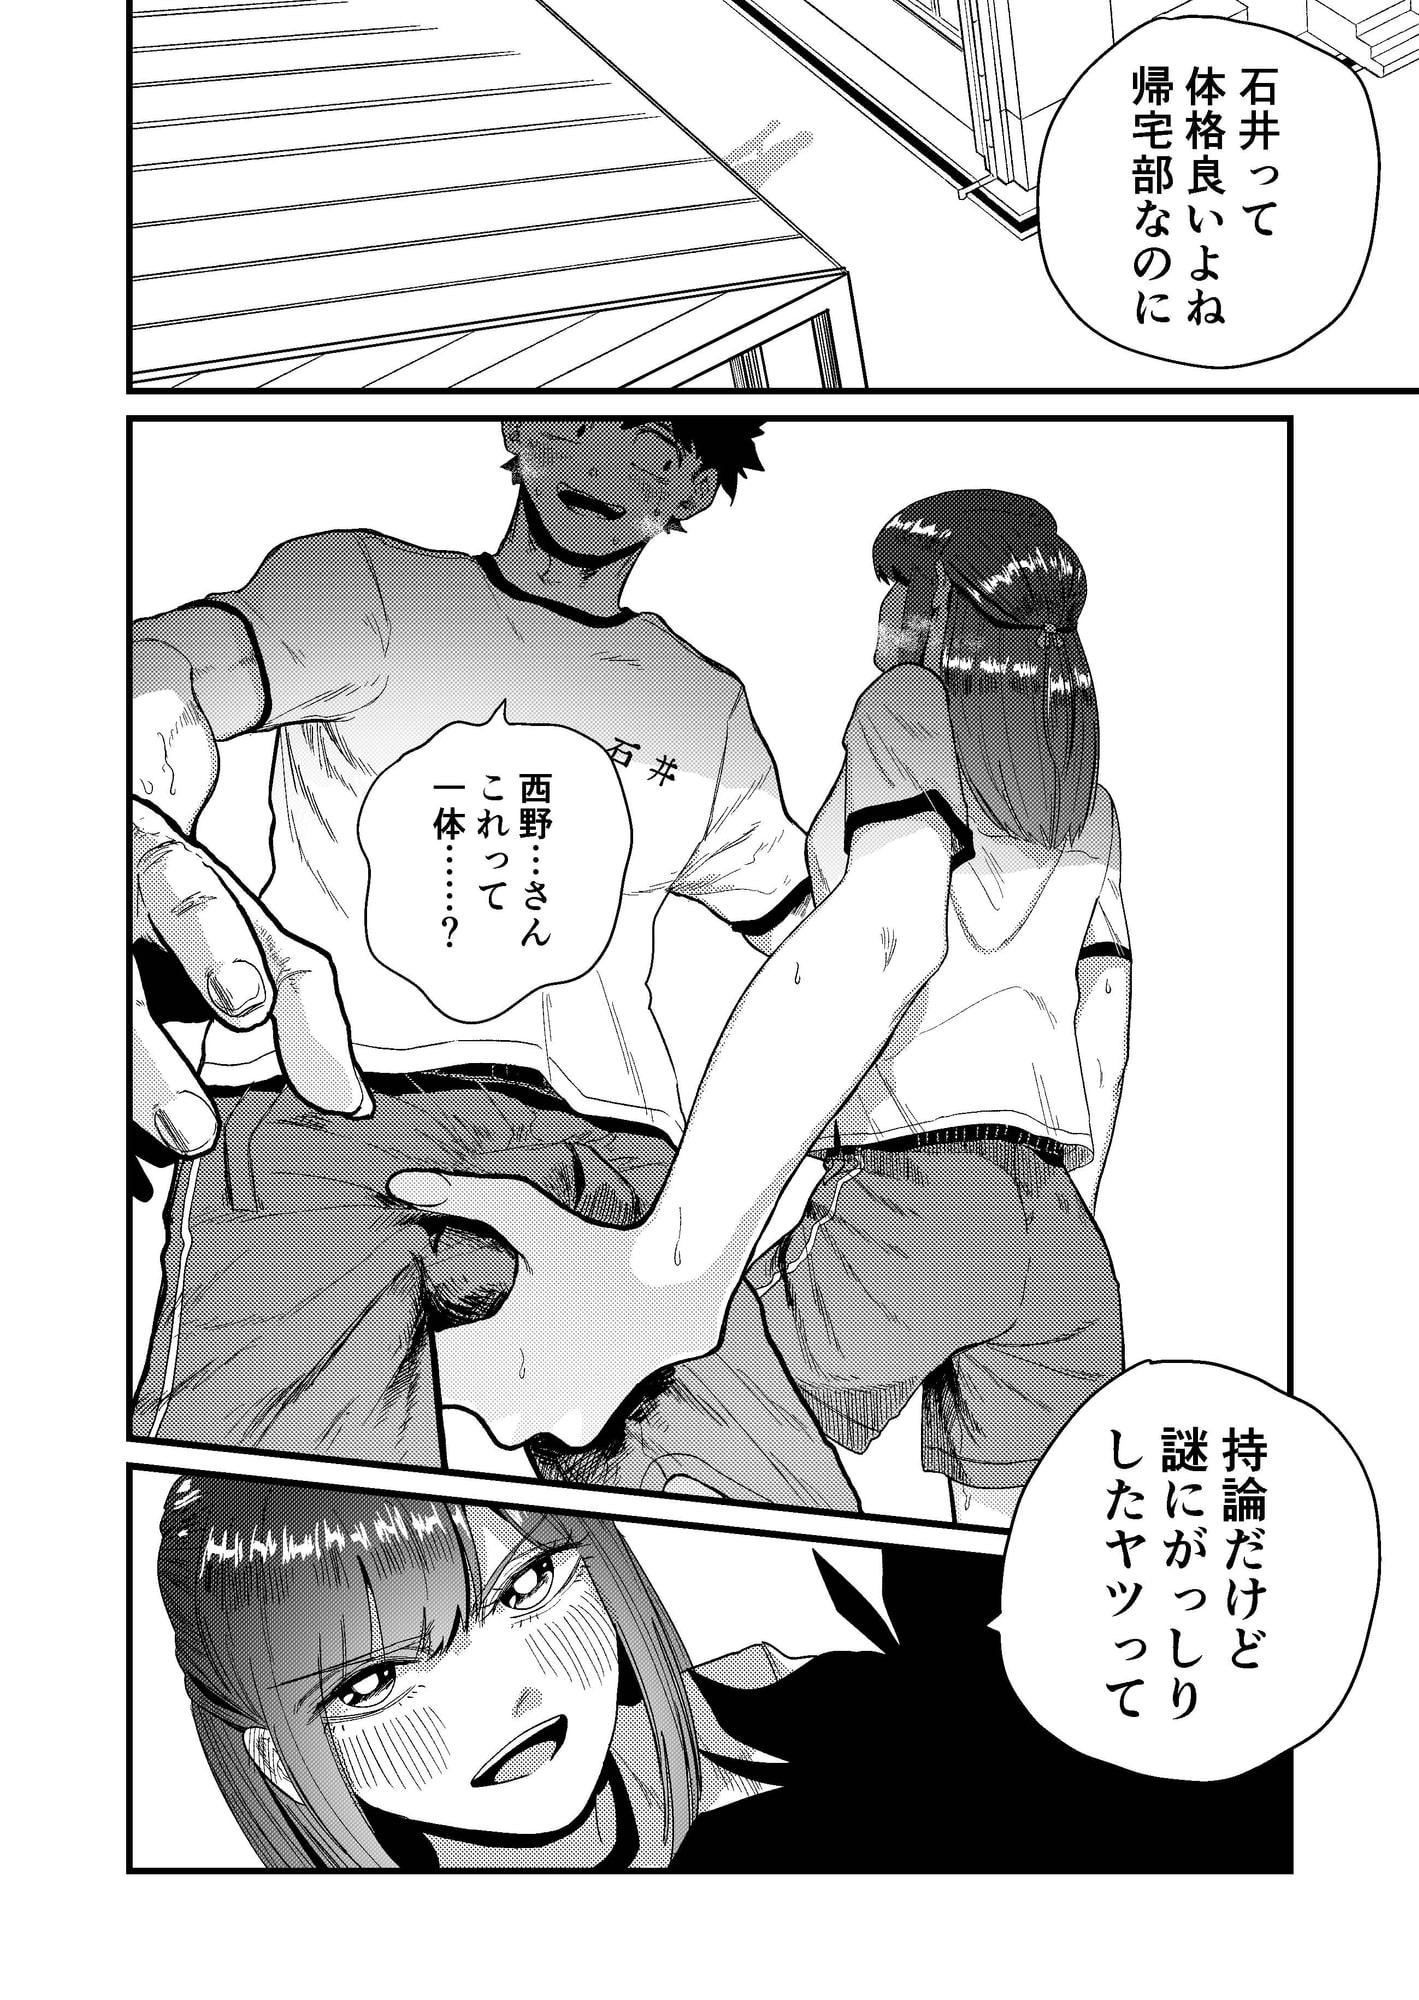 RJ334946 マゾ狩り西野さん [20210713]